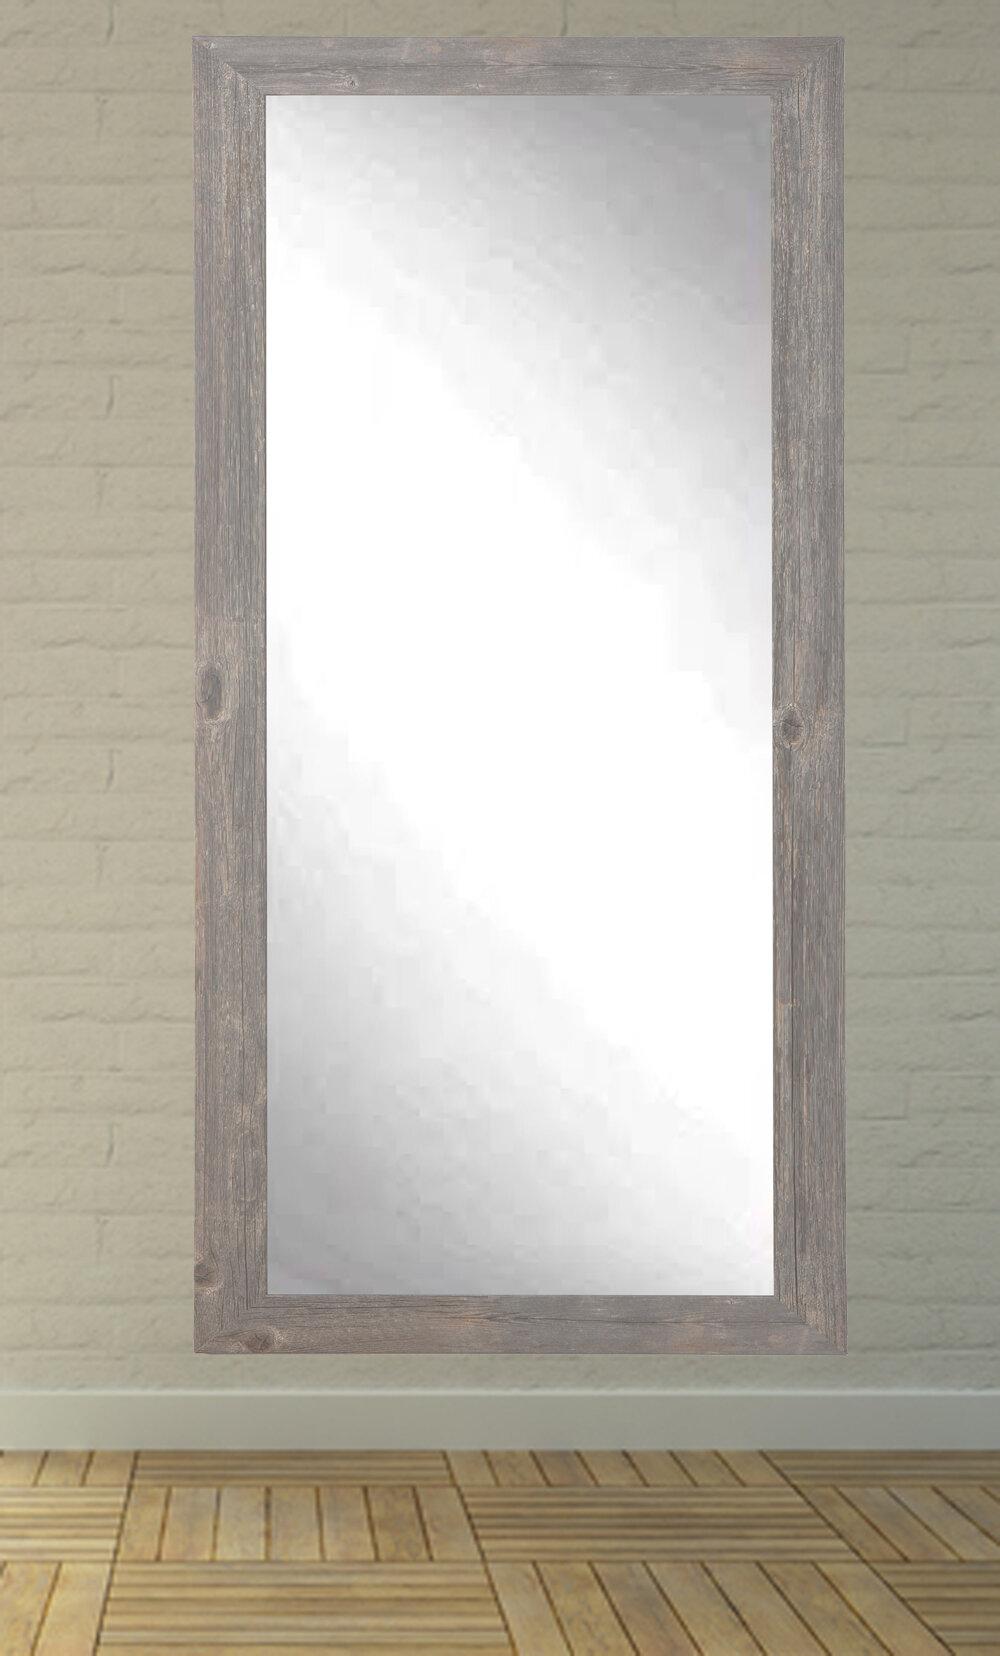 Union Rustic Iona Rustic Wild West Barnwood Full Length Wall Mirror ...